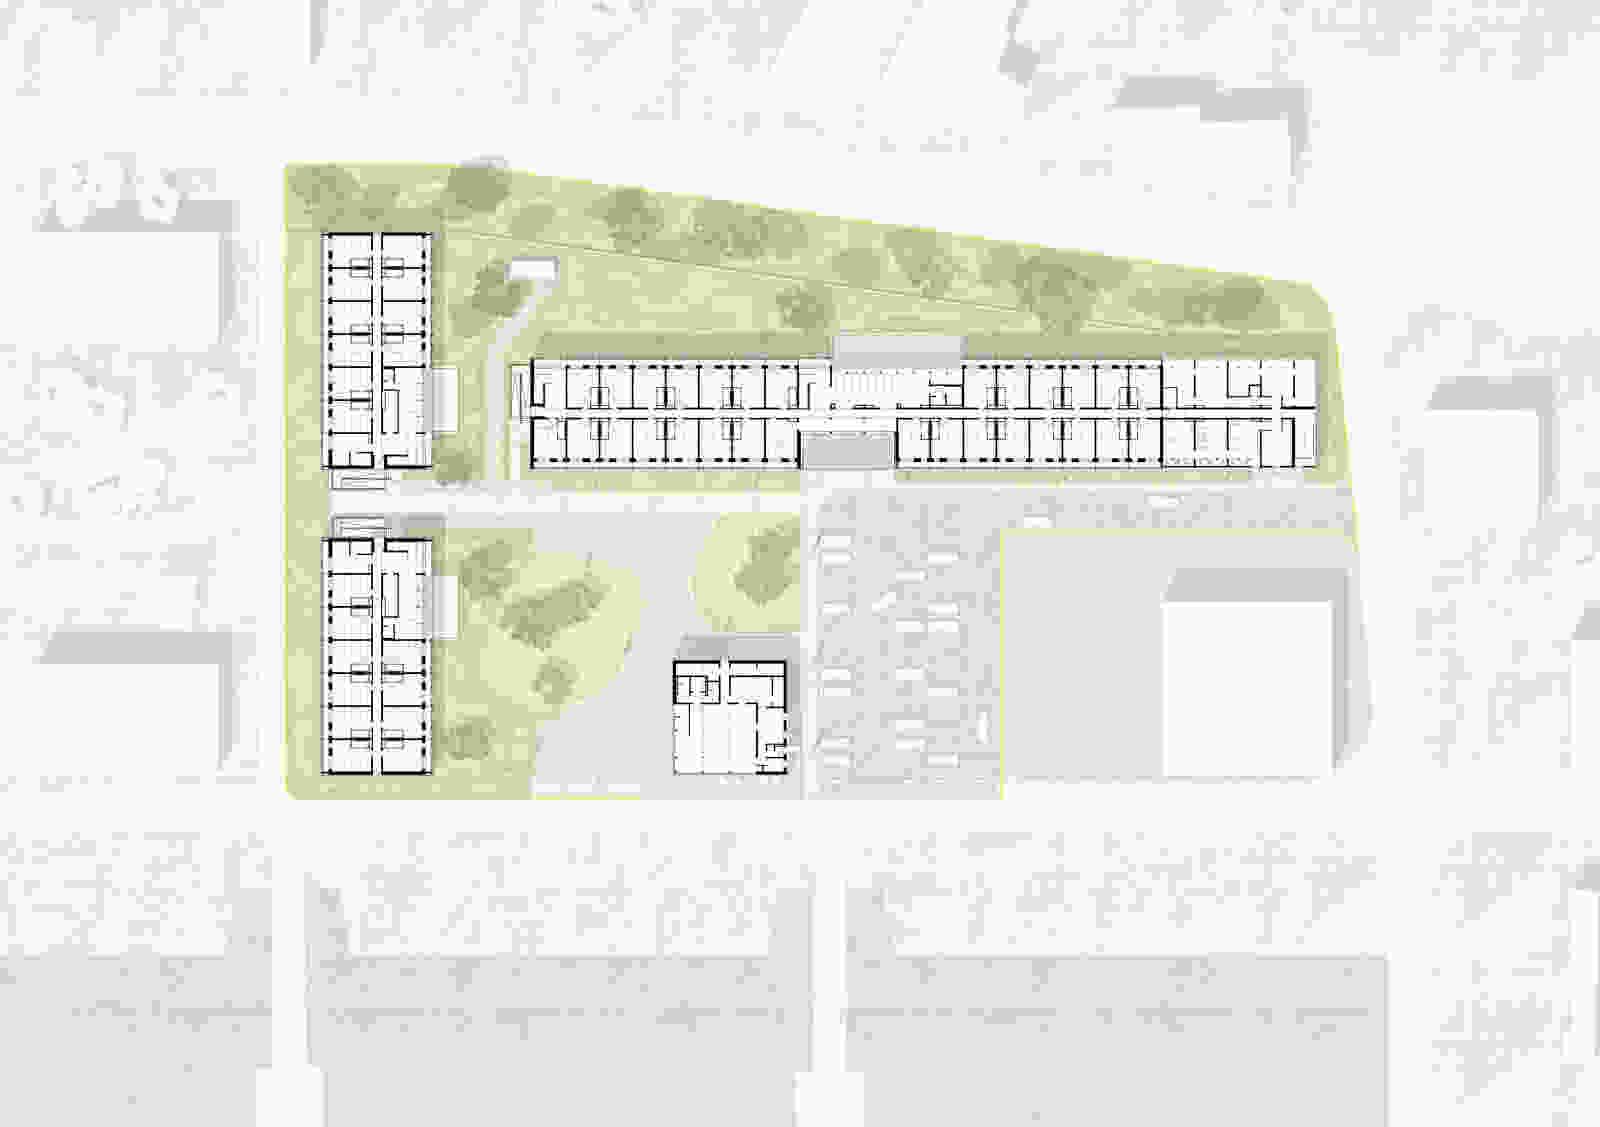 410 dmaa plan 03 ground floor plan 01